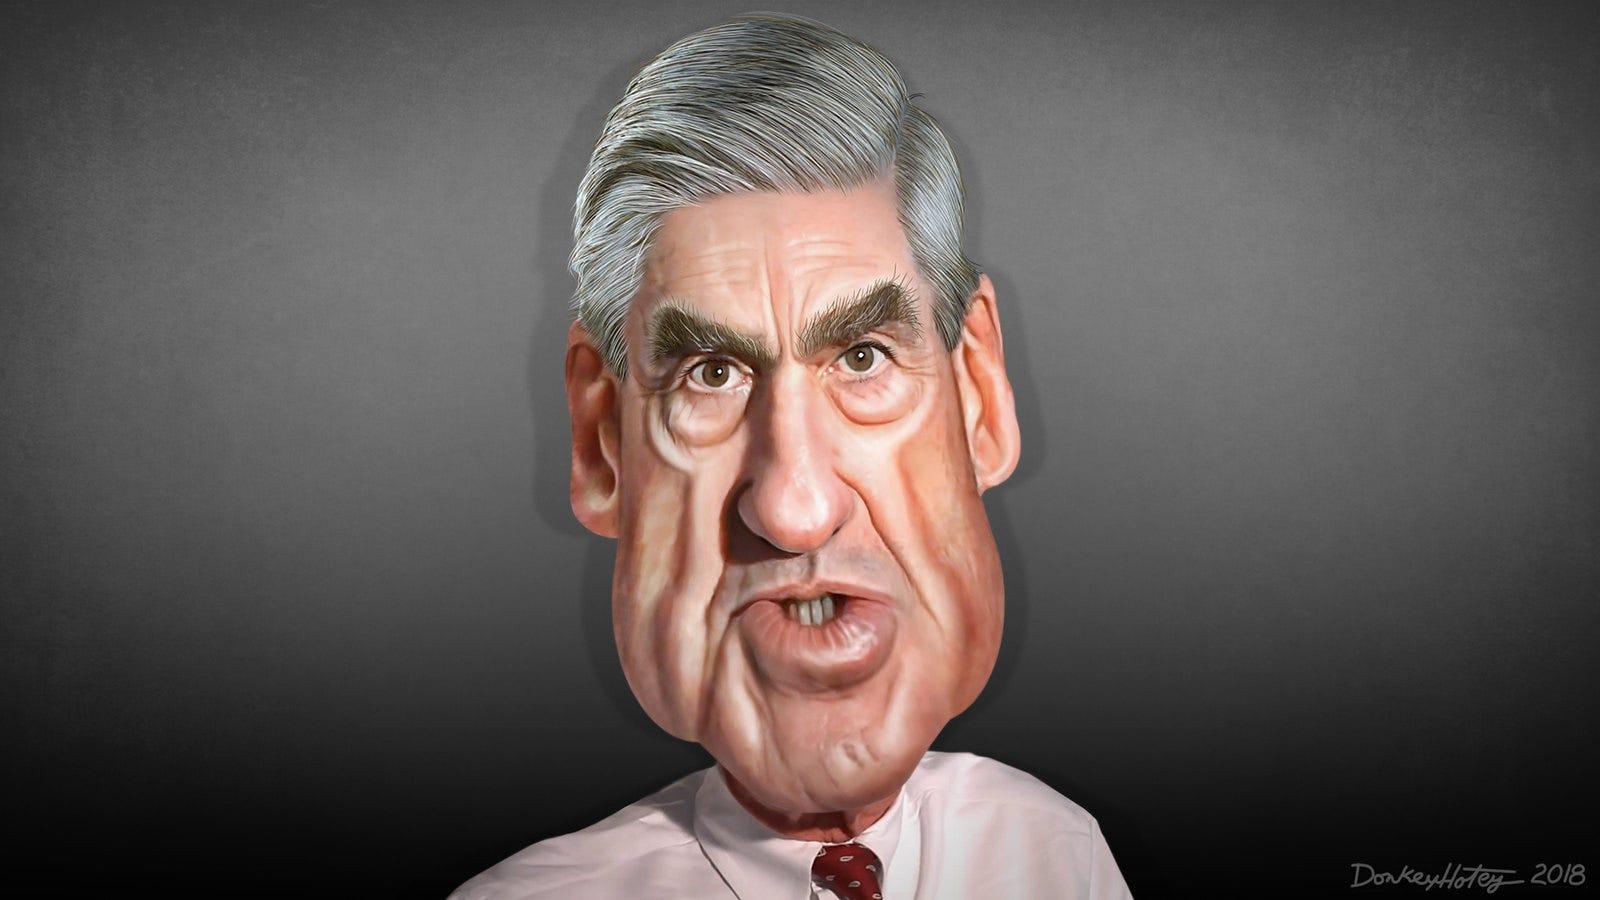 The rise and fall of superhero Robert Mueller